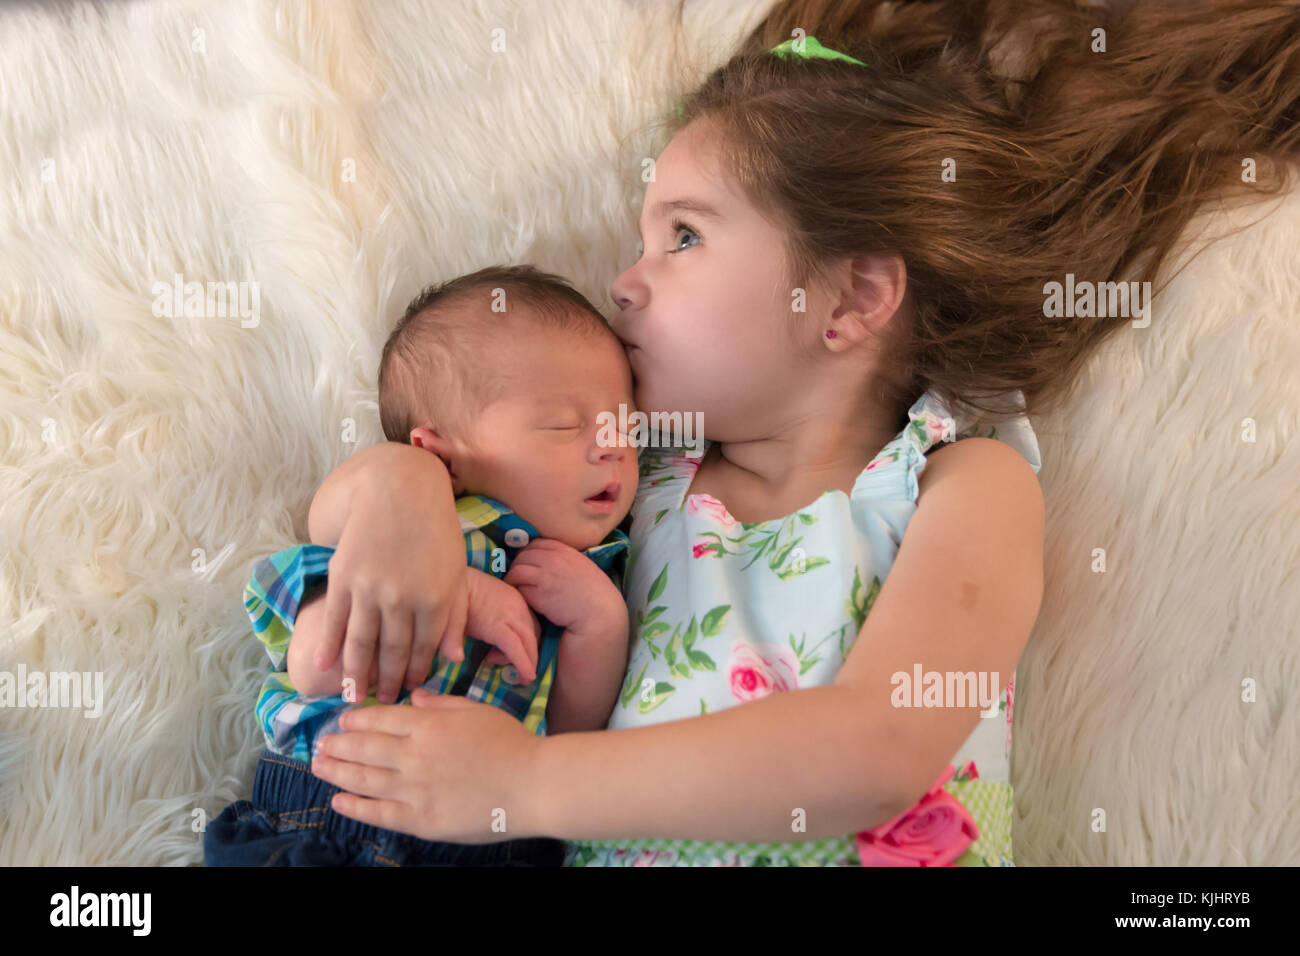 IrisMagic Family and Children Photos Stock Photo